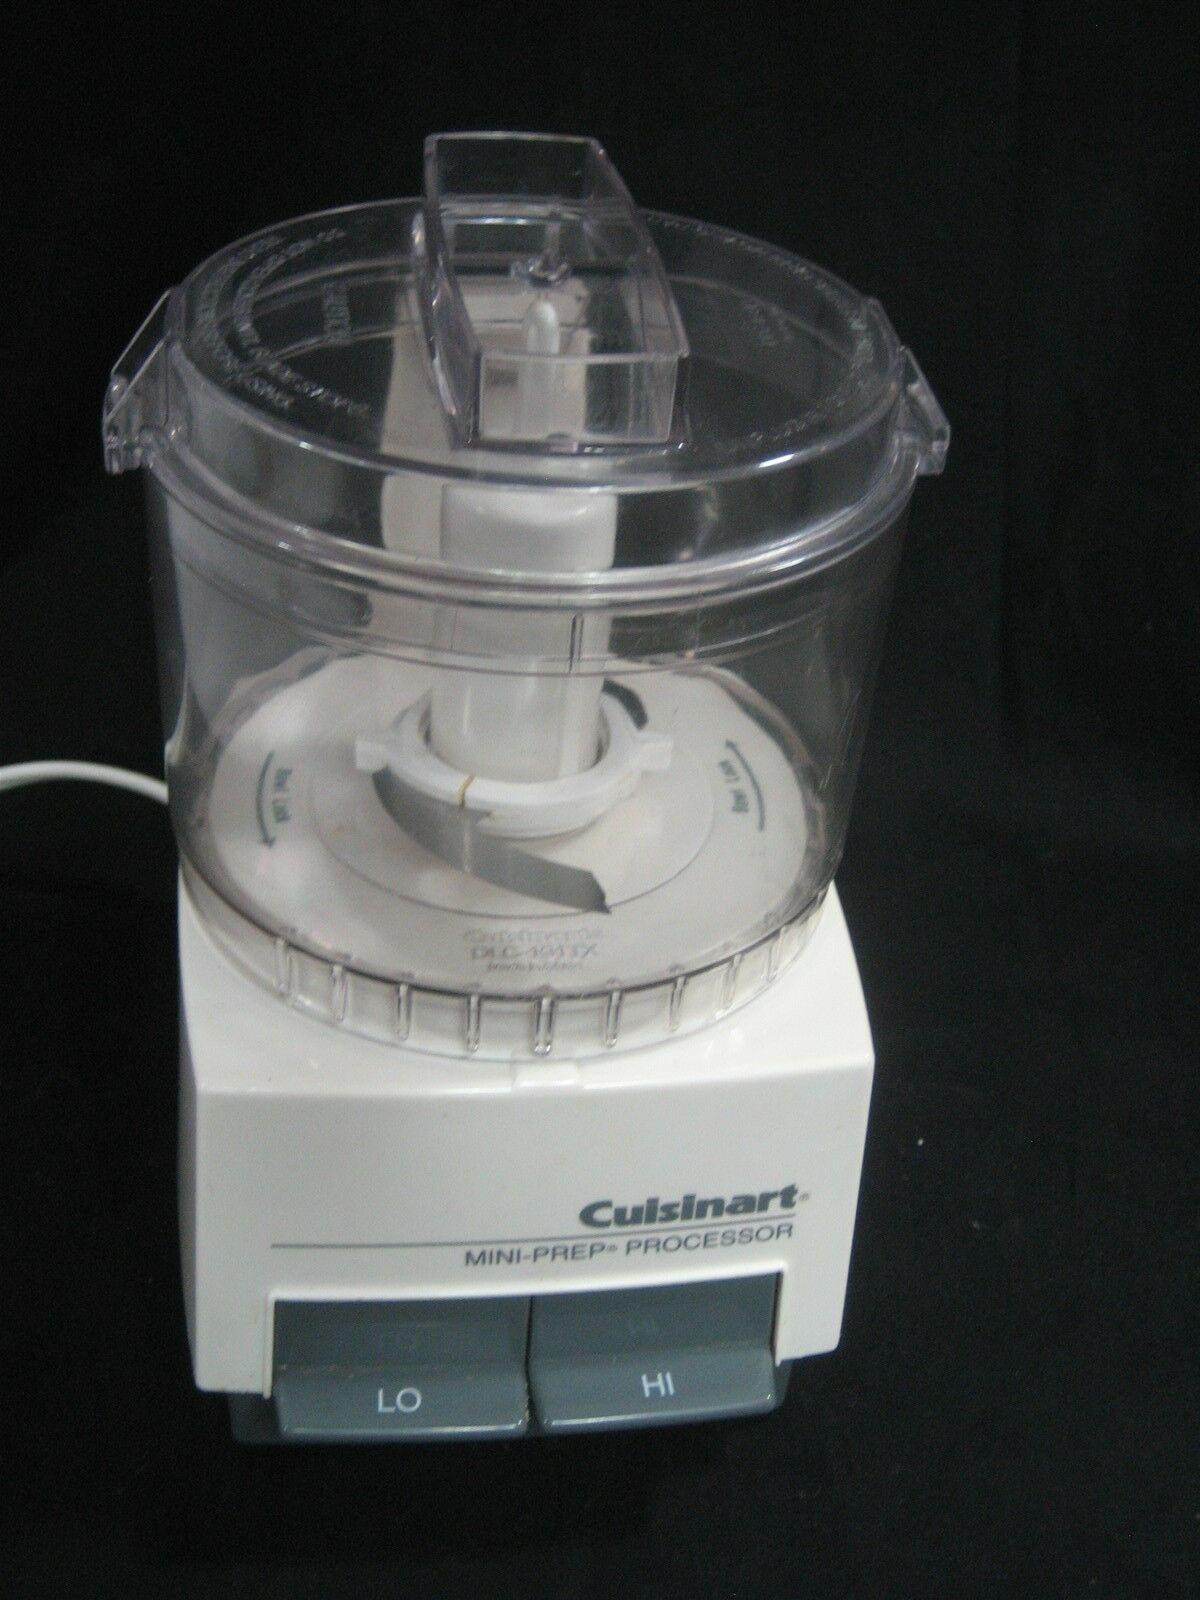 Cuisinart Mini-Prep Food Processor 250 Watt